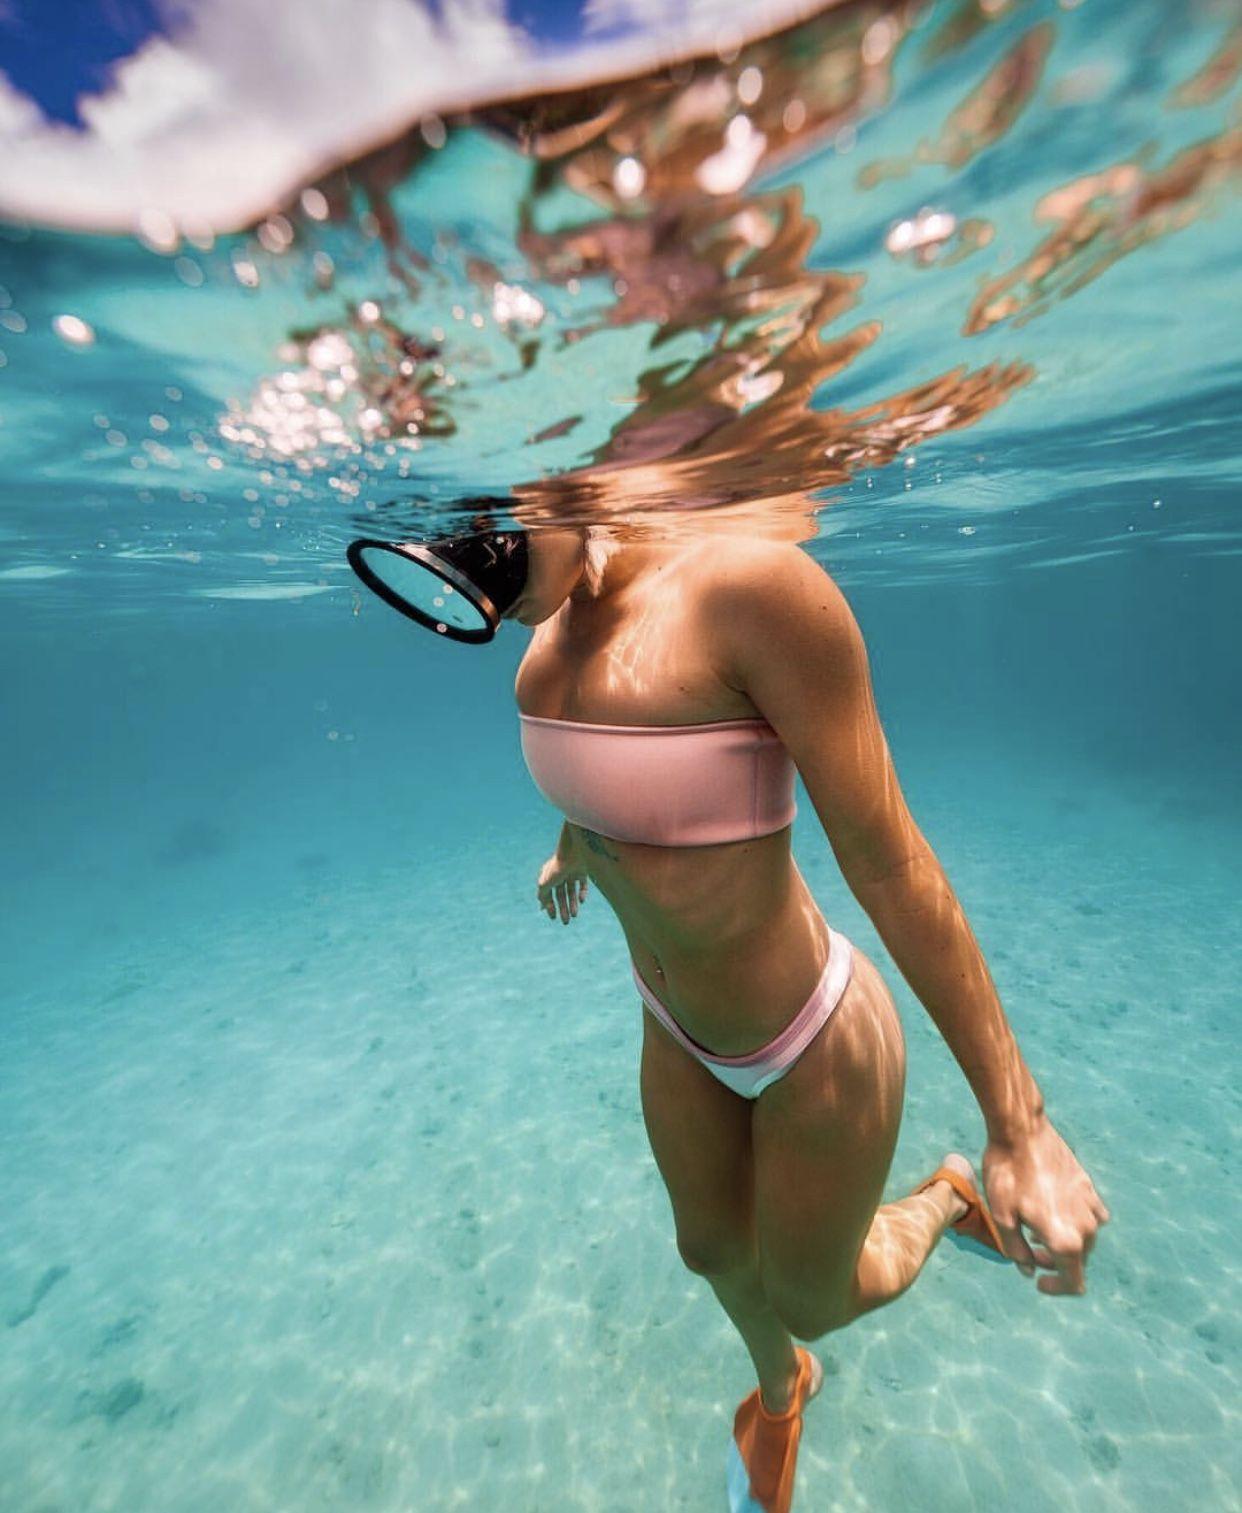 Beautiful woman bikini image photo